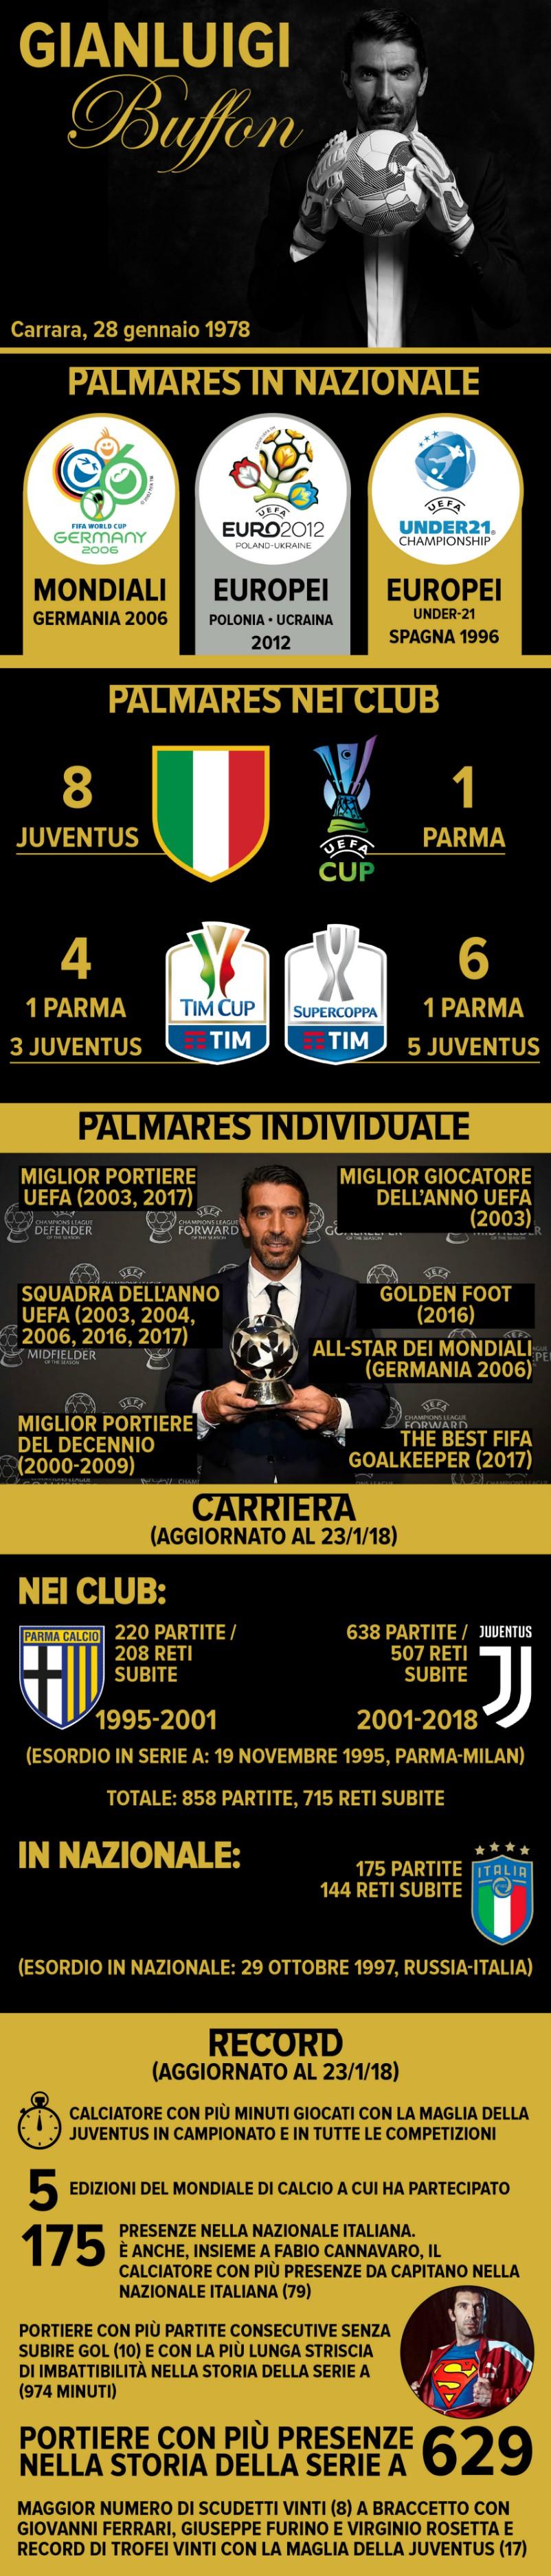 "Juventus, il saluto di Buffon: ""Sarà sempre casa mia, grazie a tutti"""